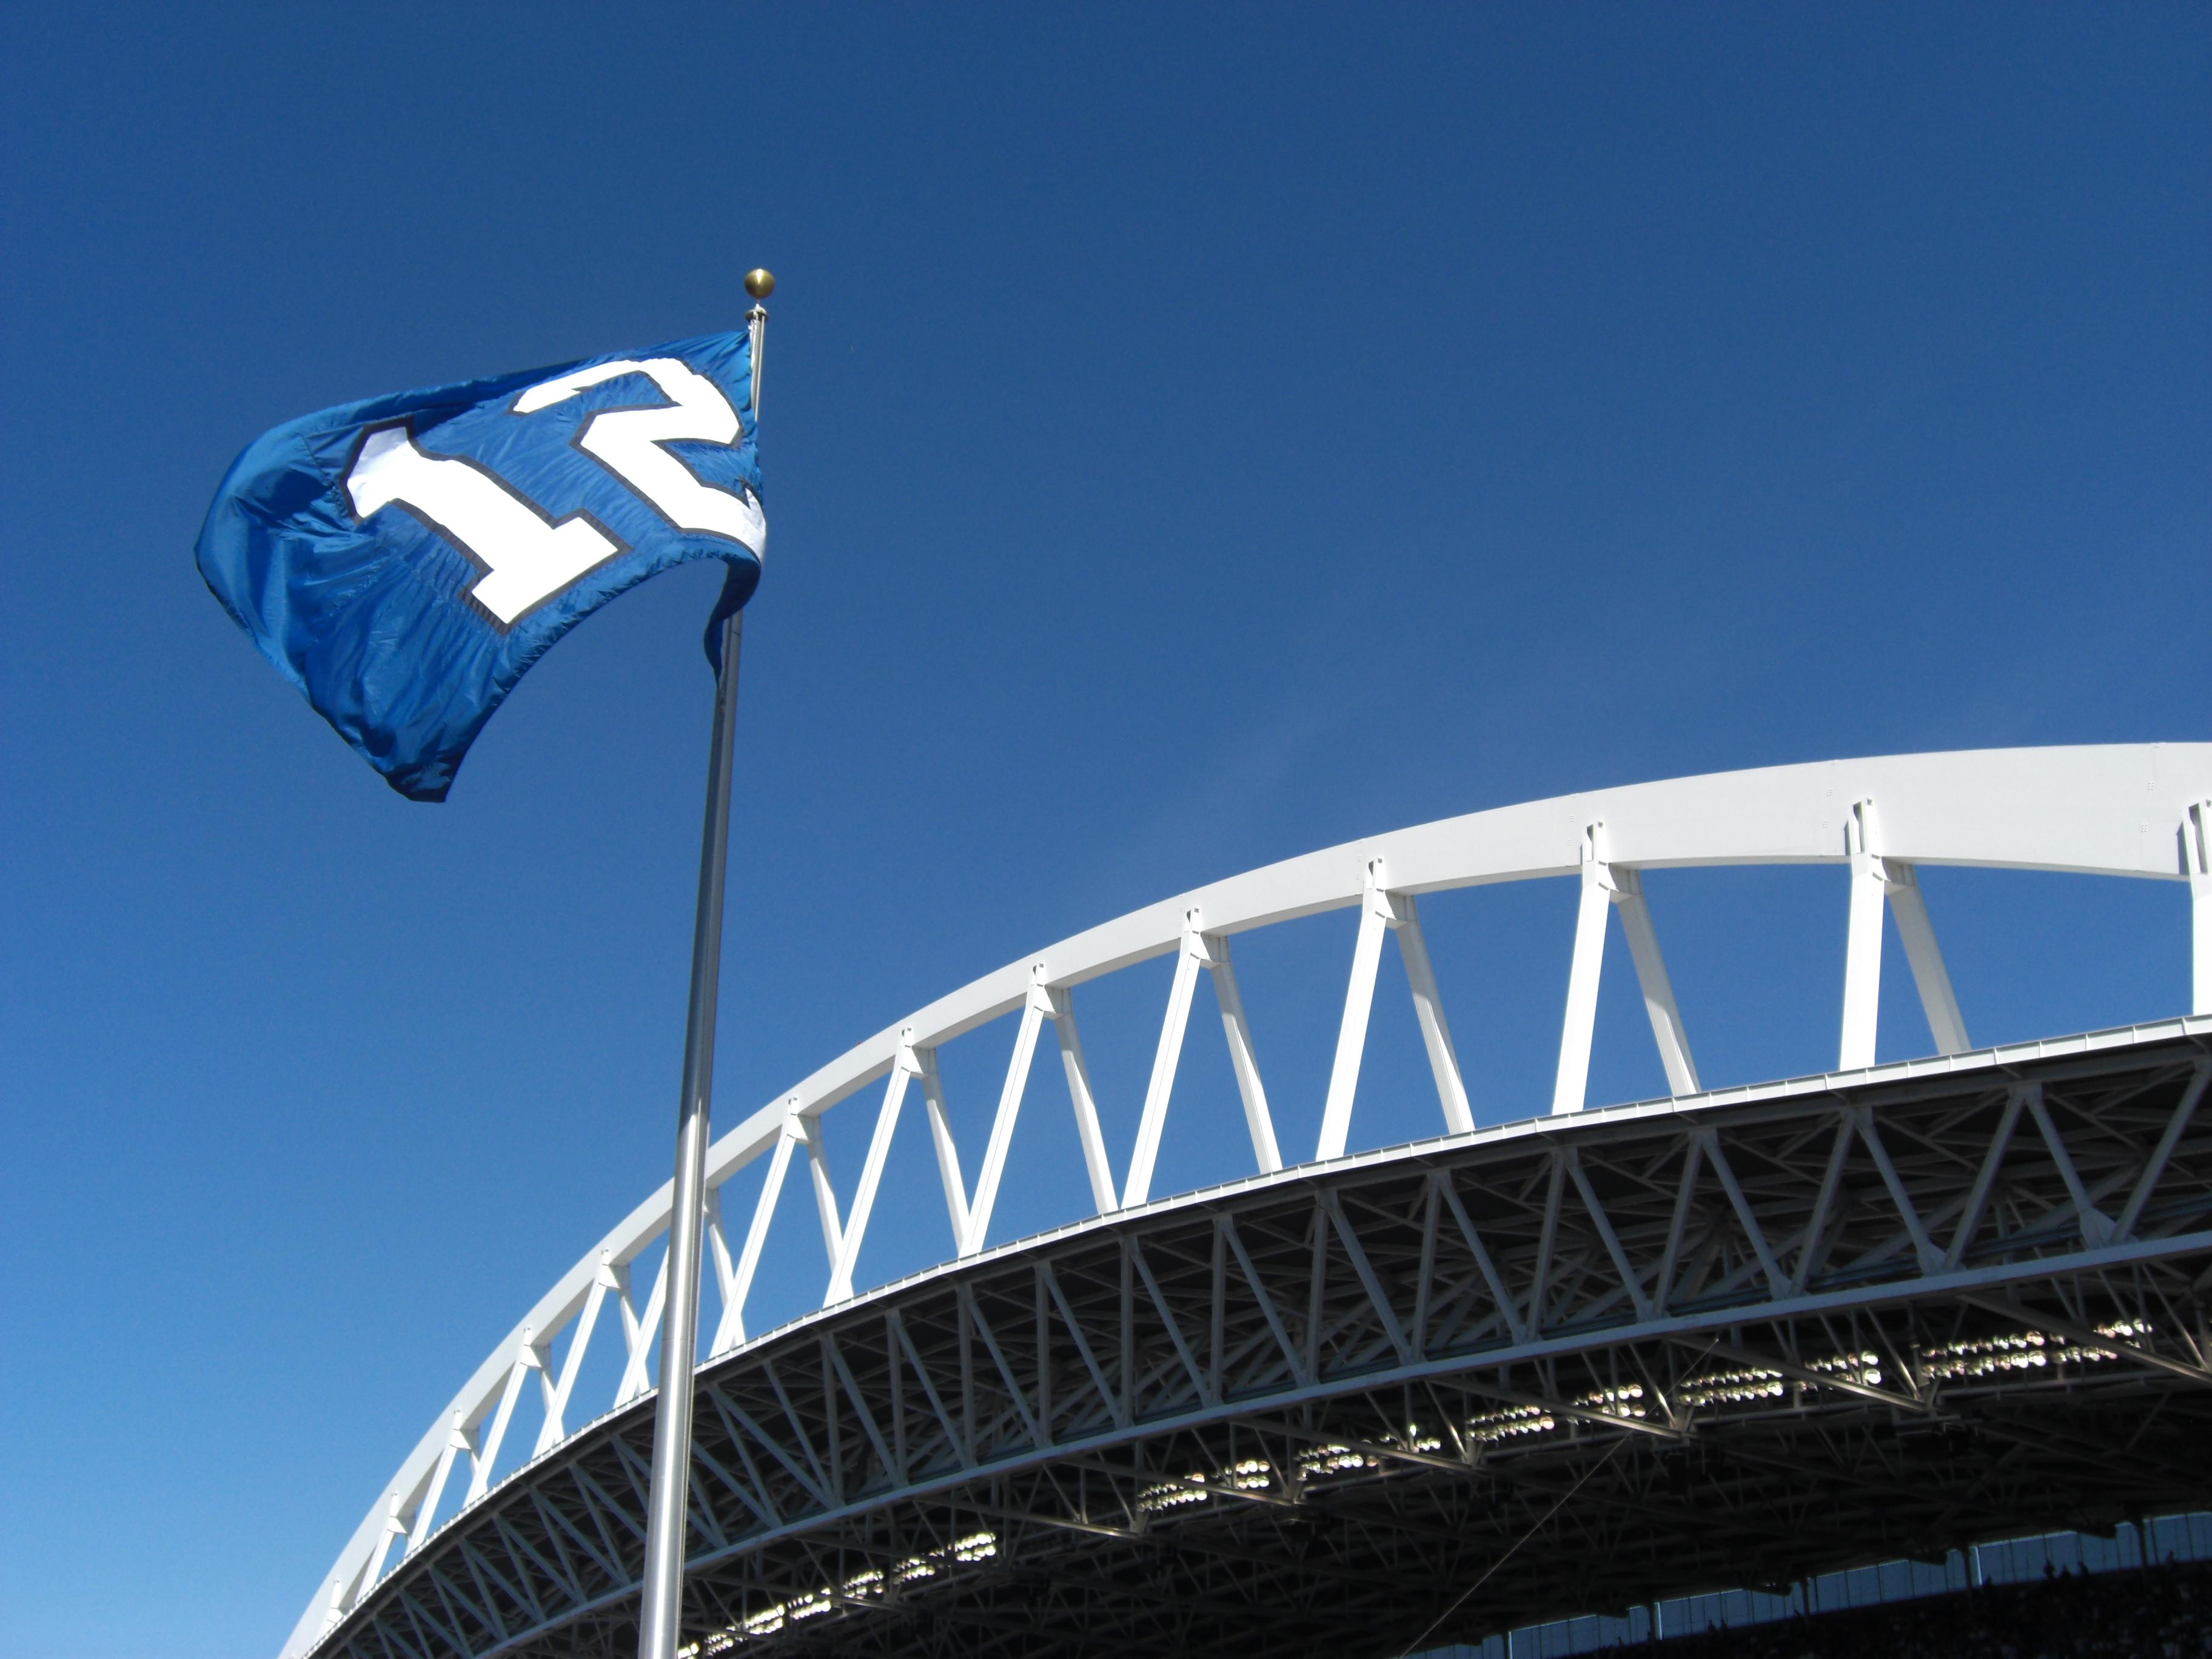 Seattle Seahawks nfl football sport stadium architecture building 3648x2736